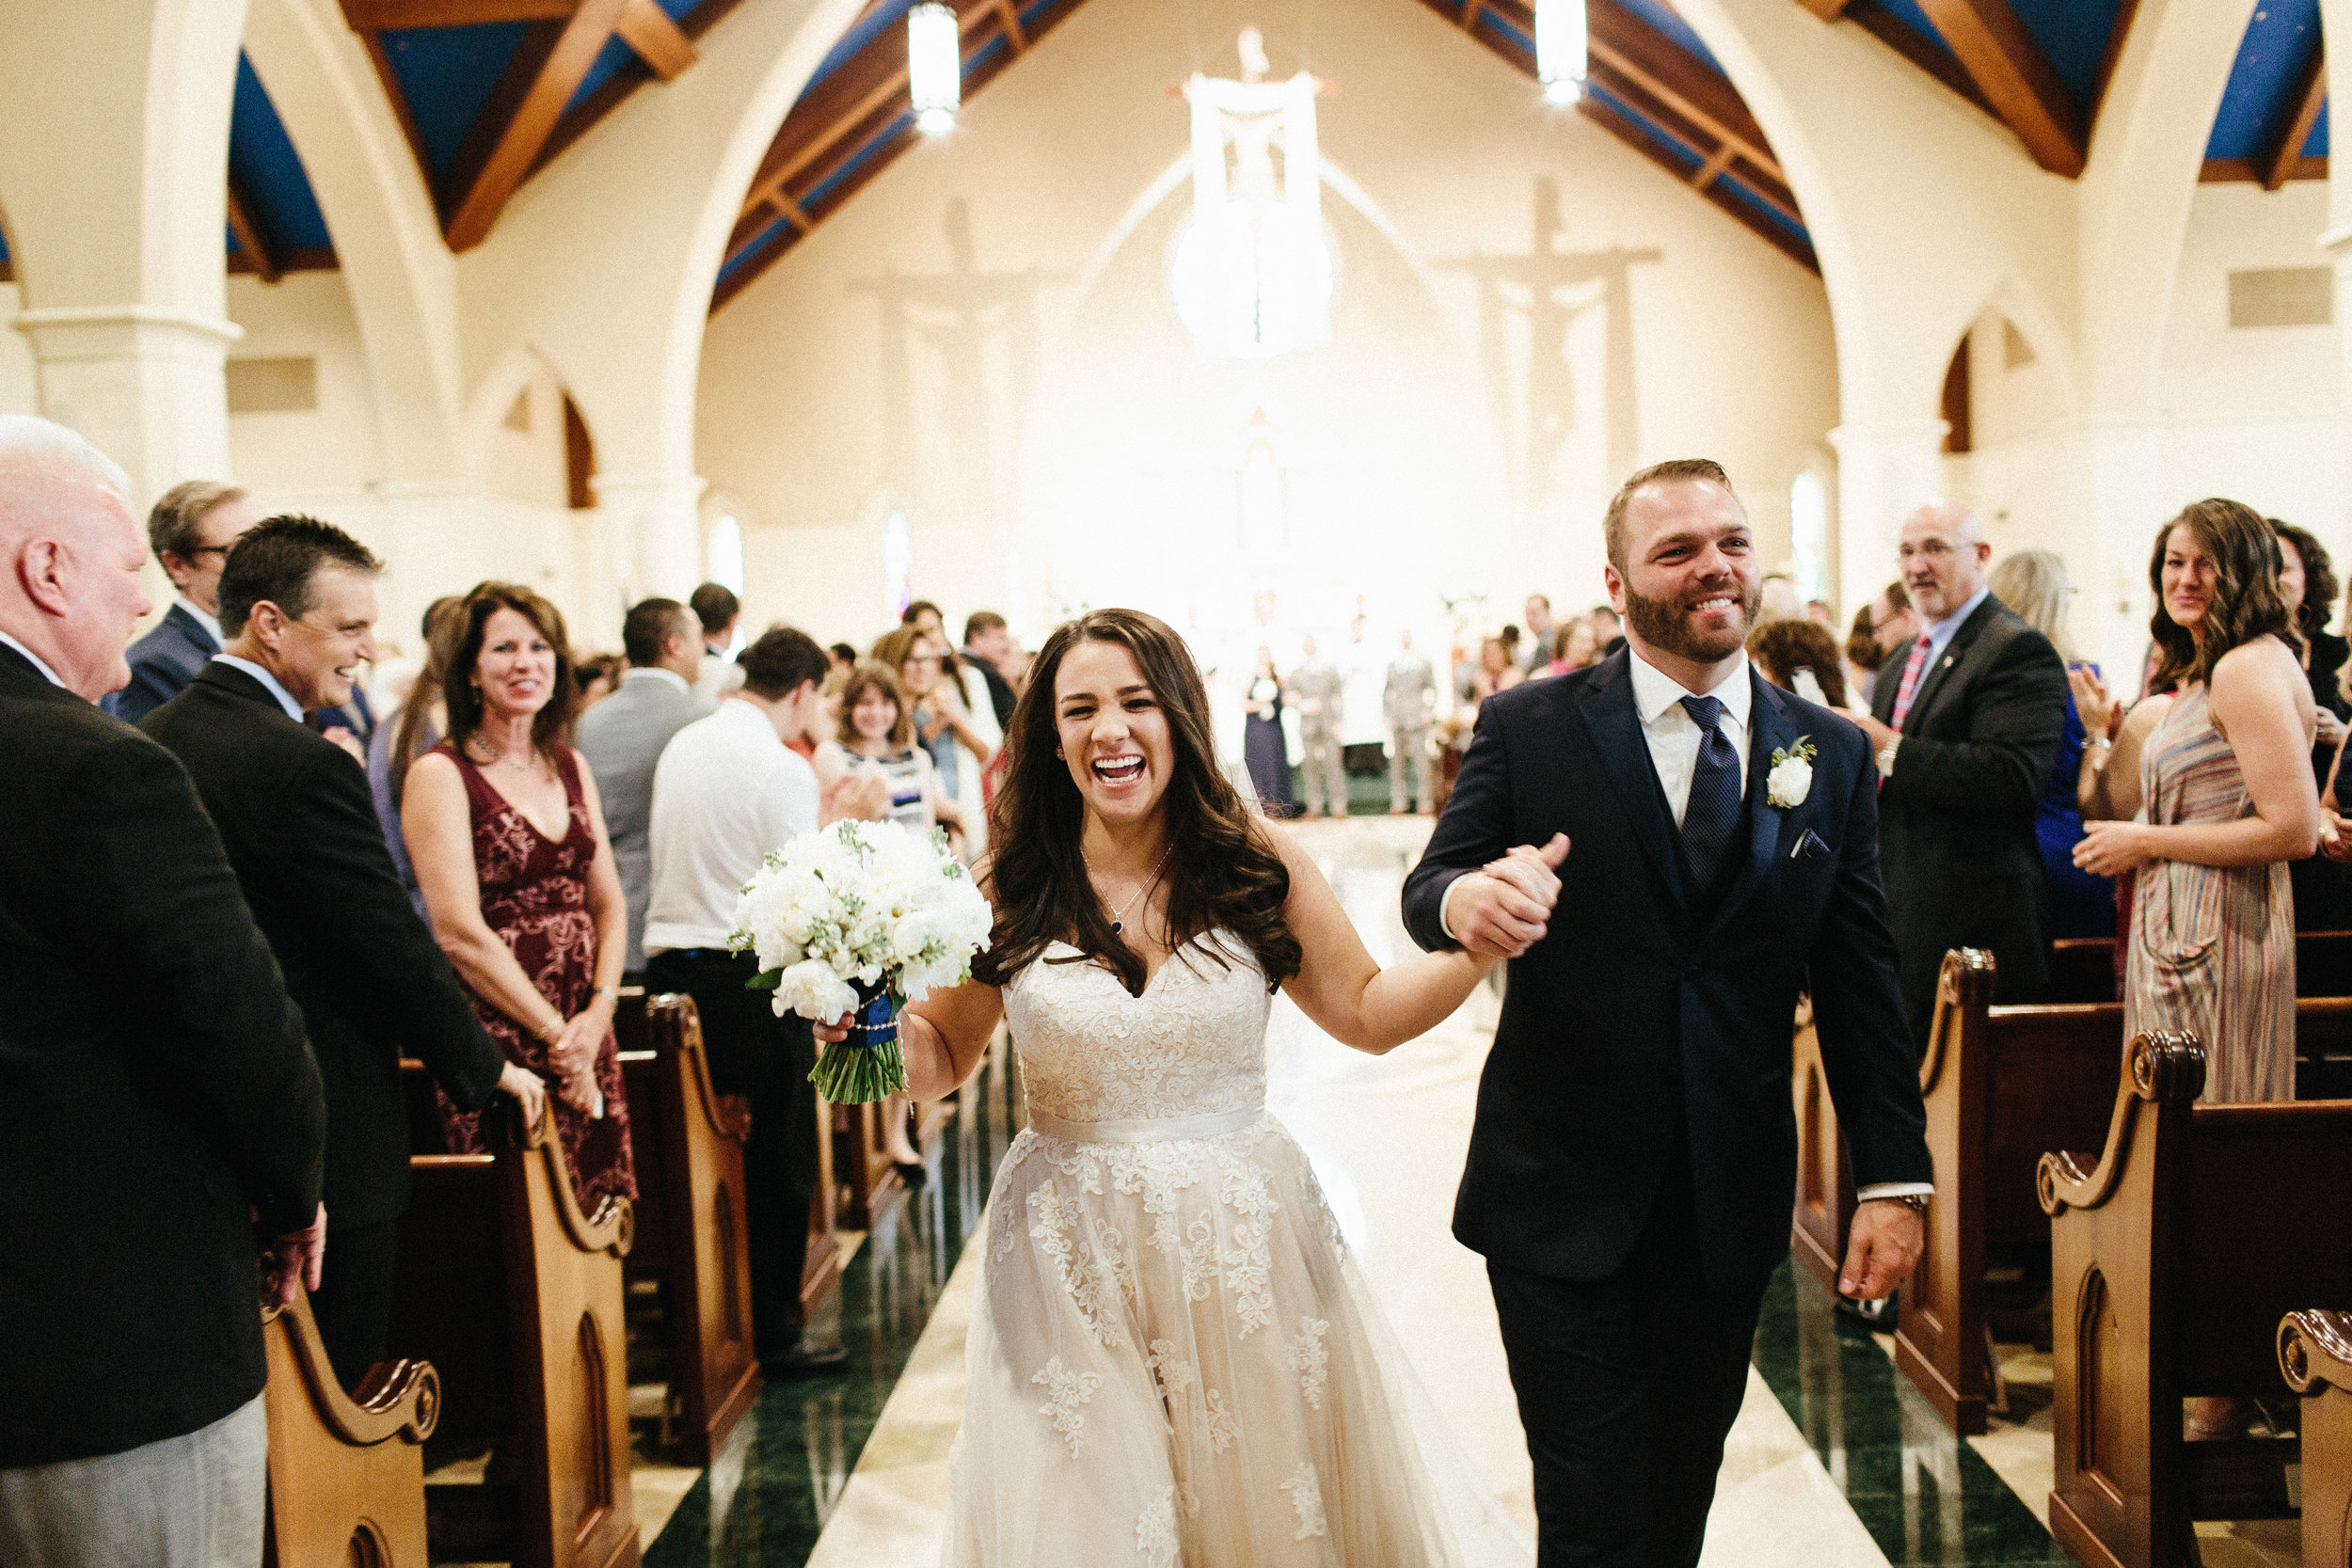 roswell_st_peter_chanel_catholic_avalon_hotel_alpharetta_wedding-1557.jpg